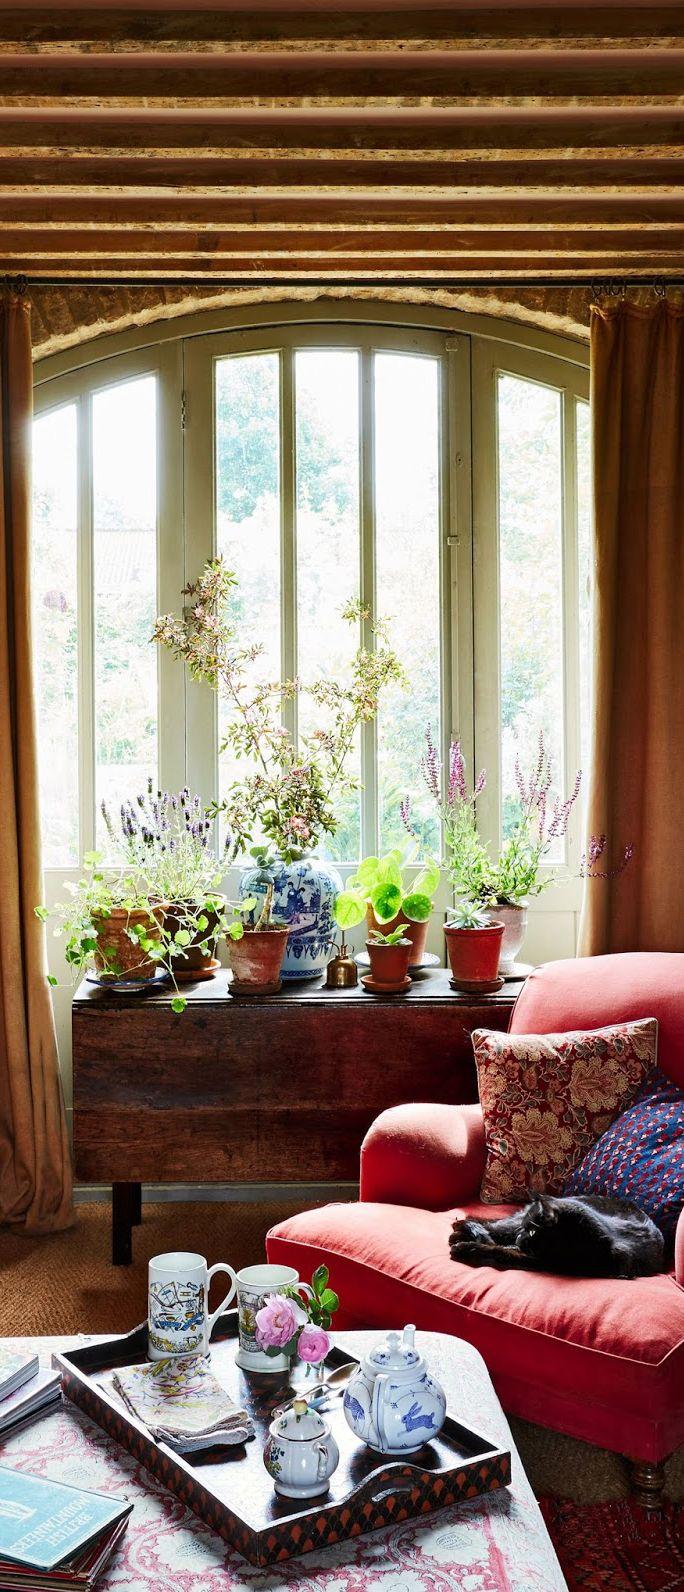 1000 ideas about living room corners on pinterest - Living room corner decor ...